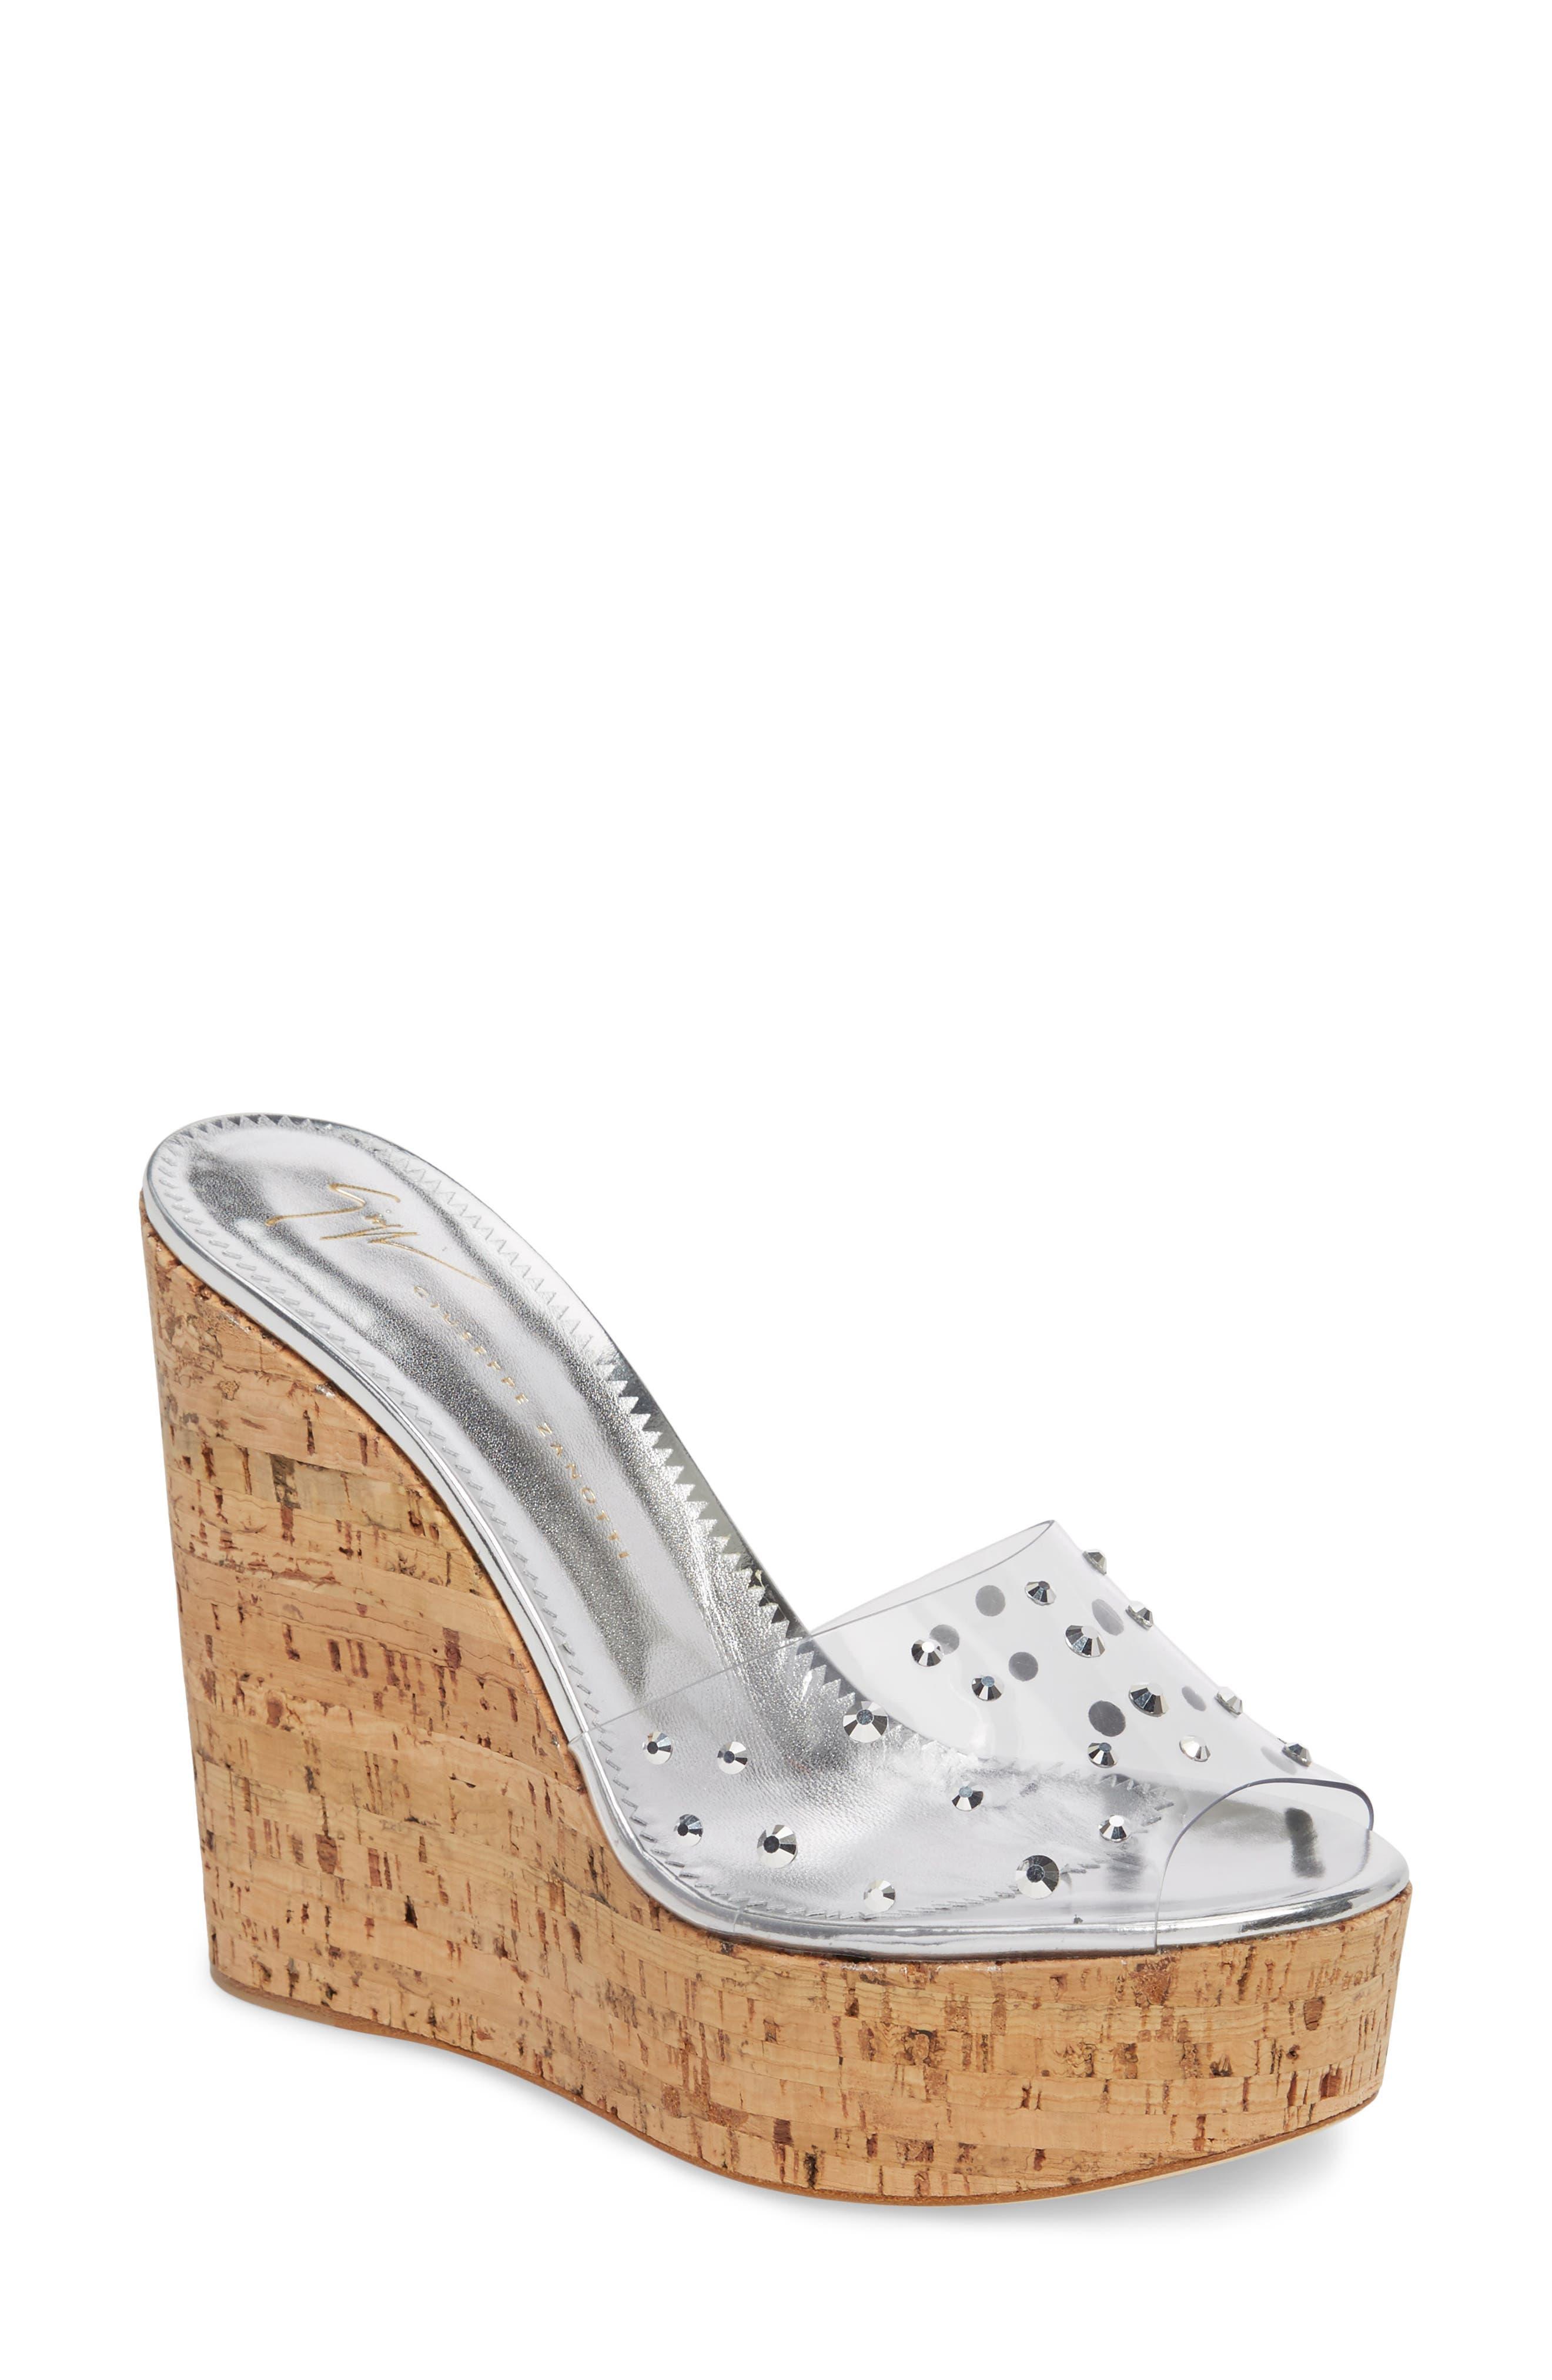 Alternate Image 1 Selected - Giuseppe Zanotti Clear Studded Platform Wedge Sandal (Women)